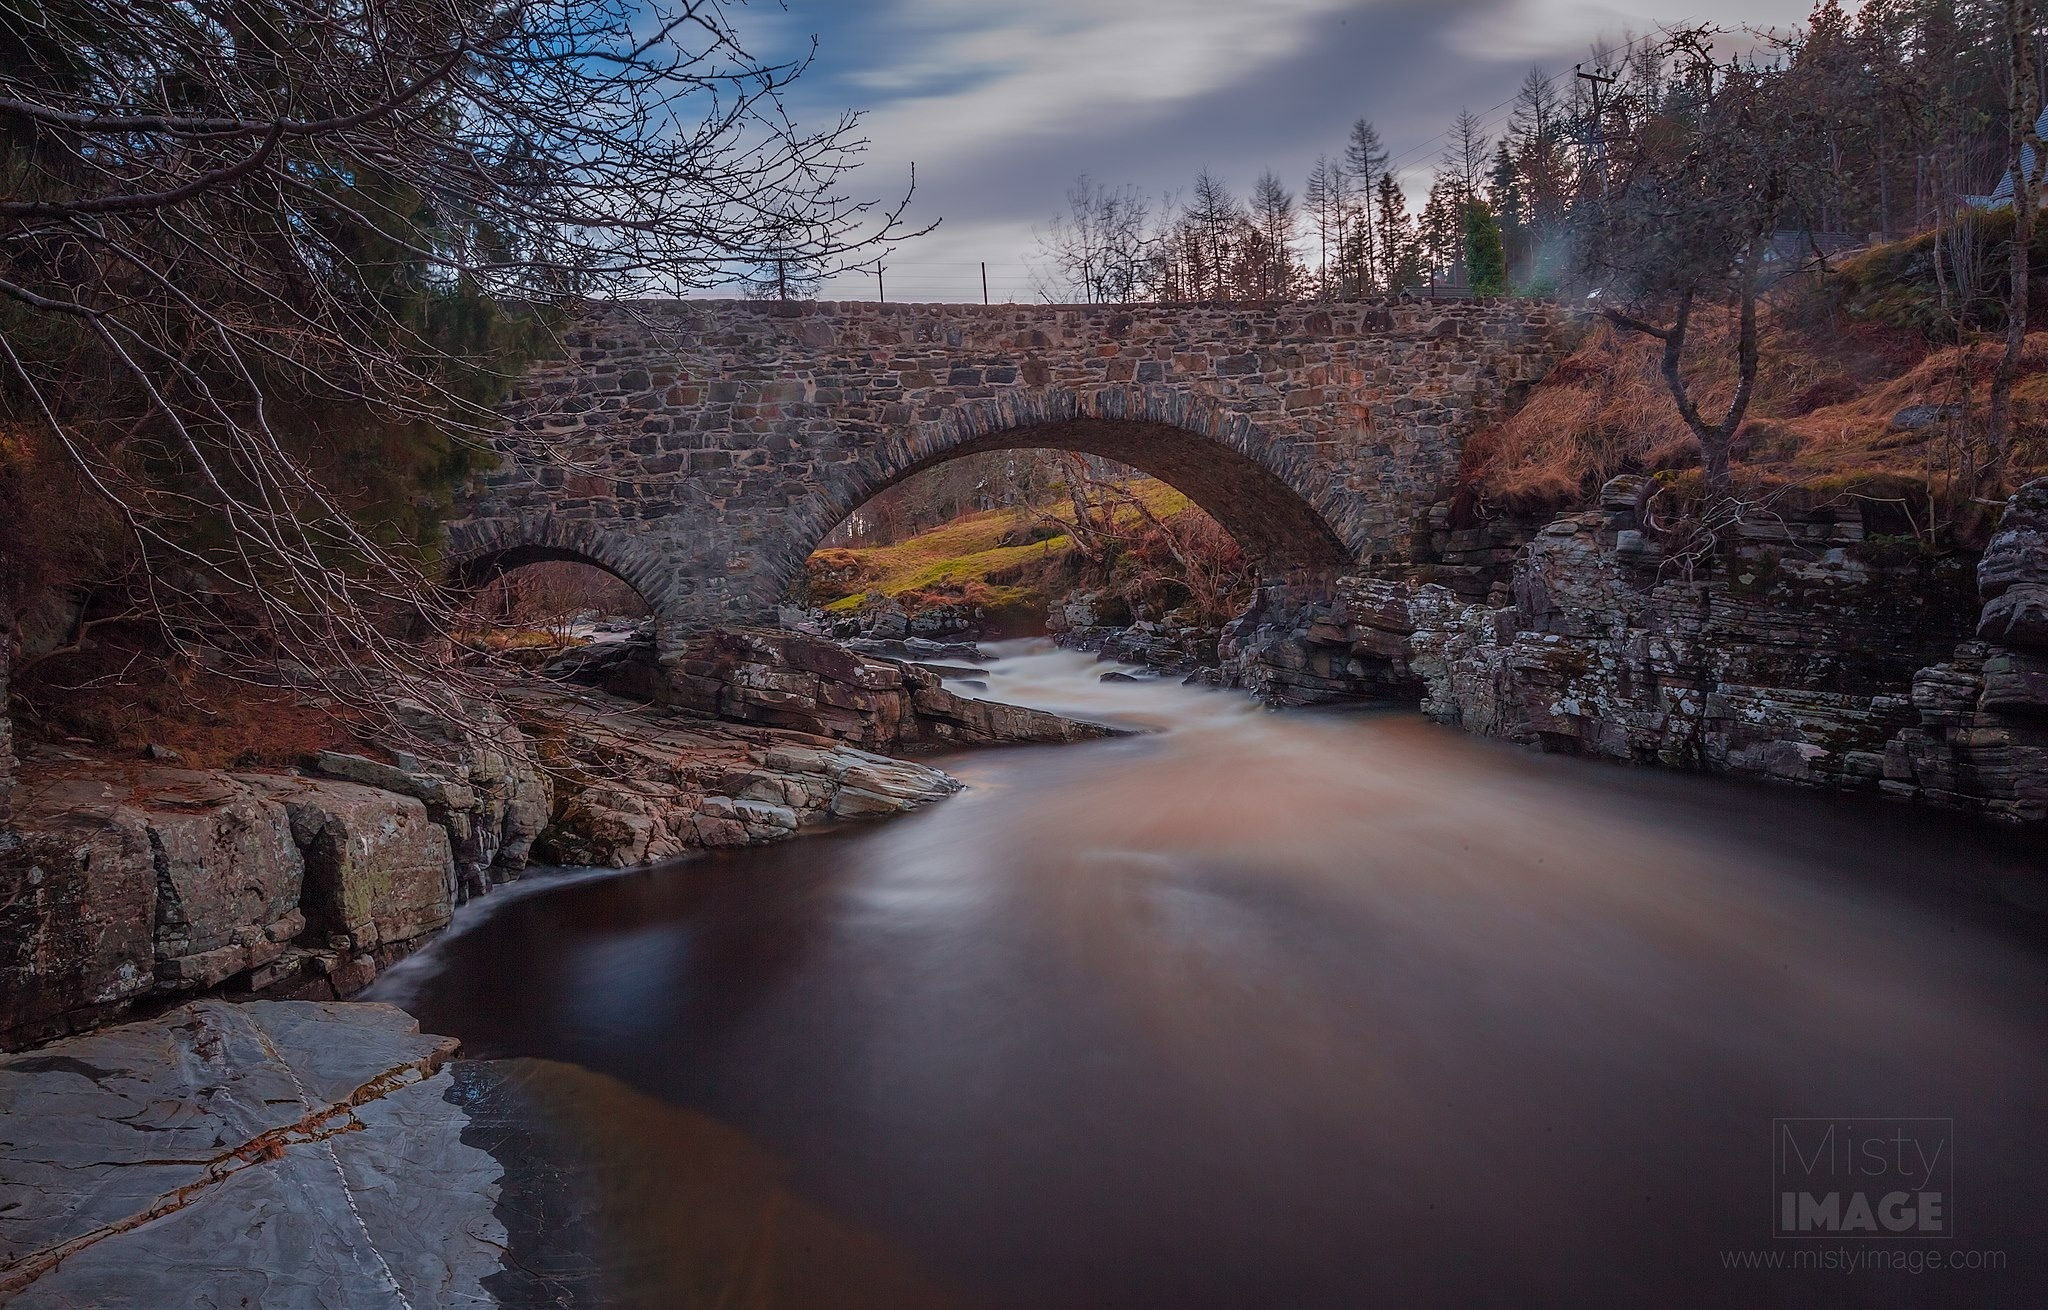 Feshiebridge in the stunning Scottish Highlands  by Gray Smith